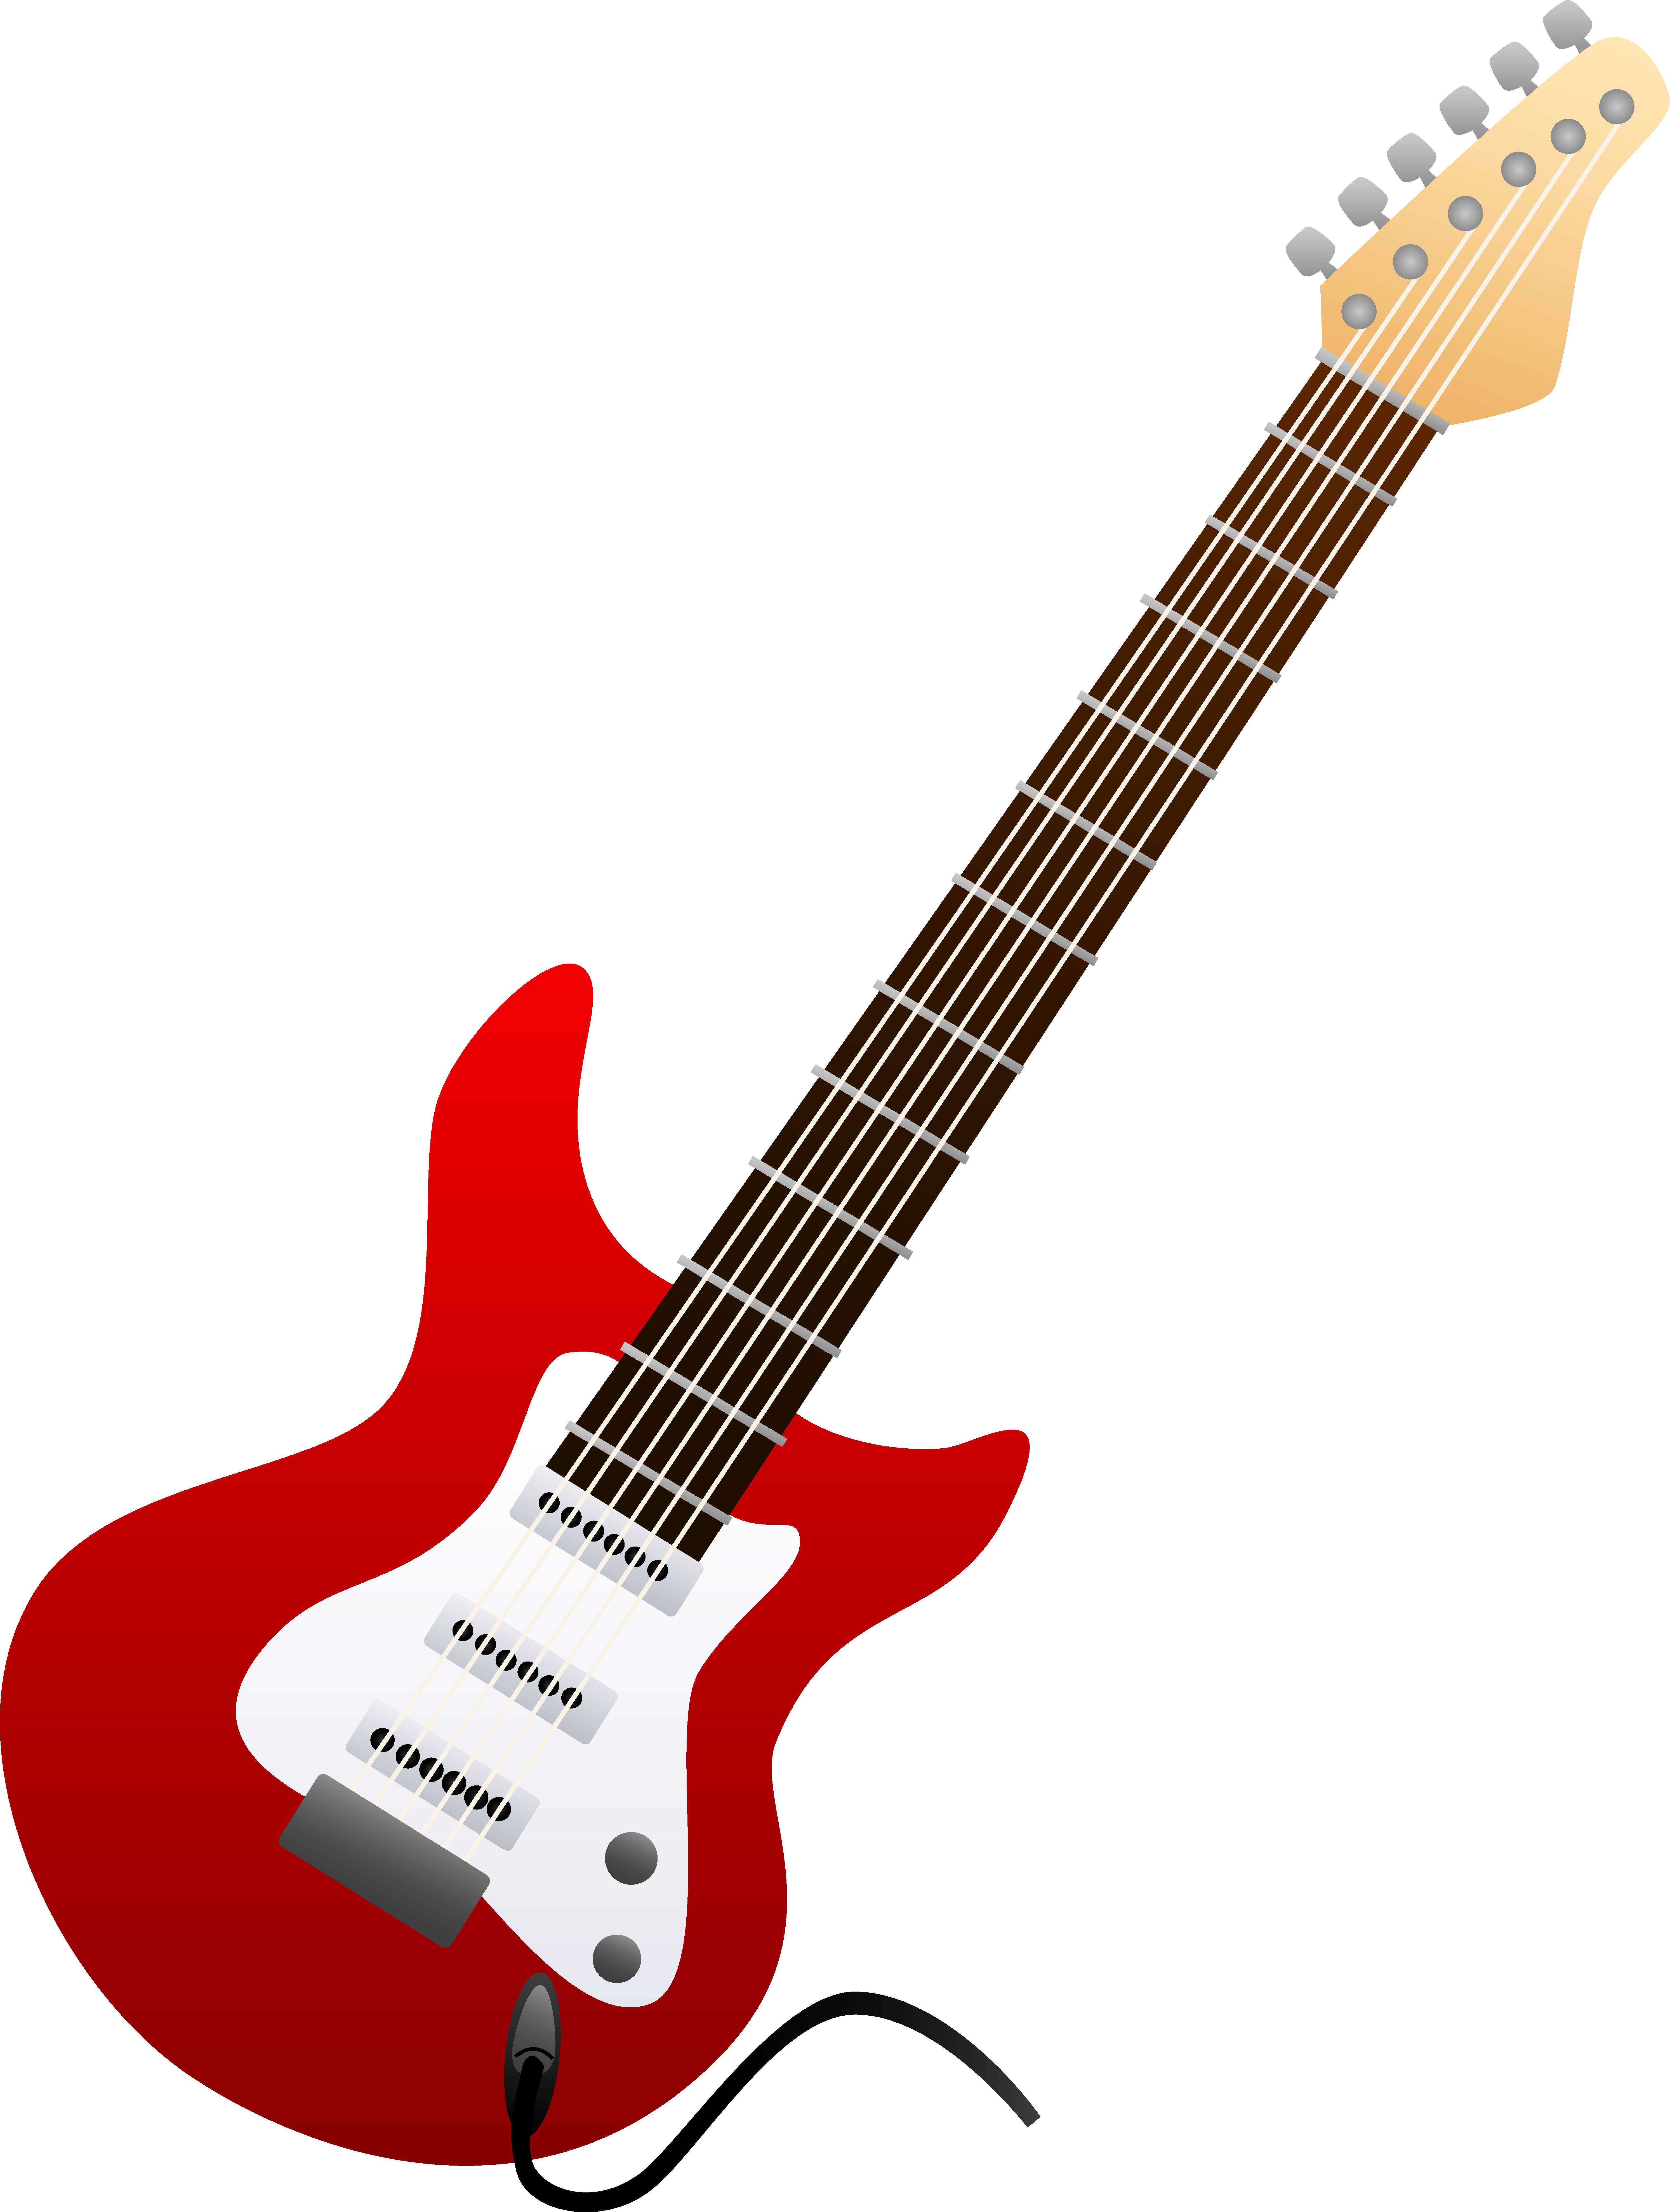 5971x7908 Red Electric Guitar Design